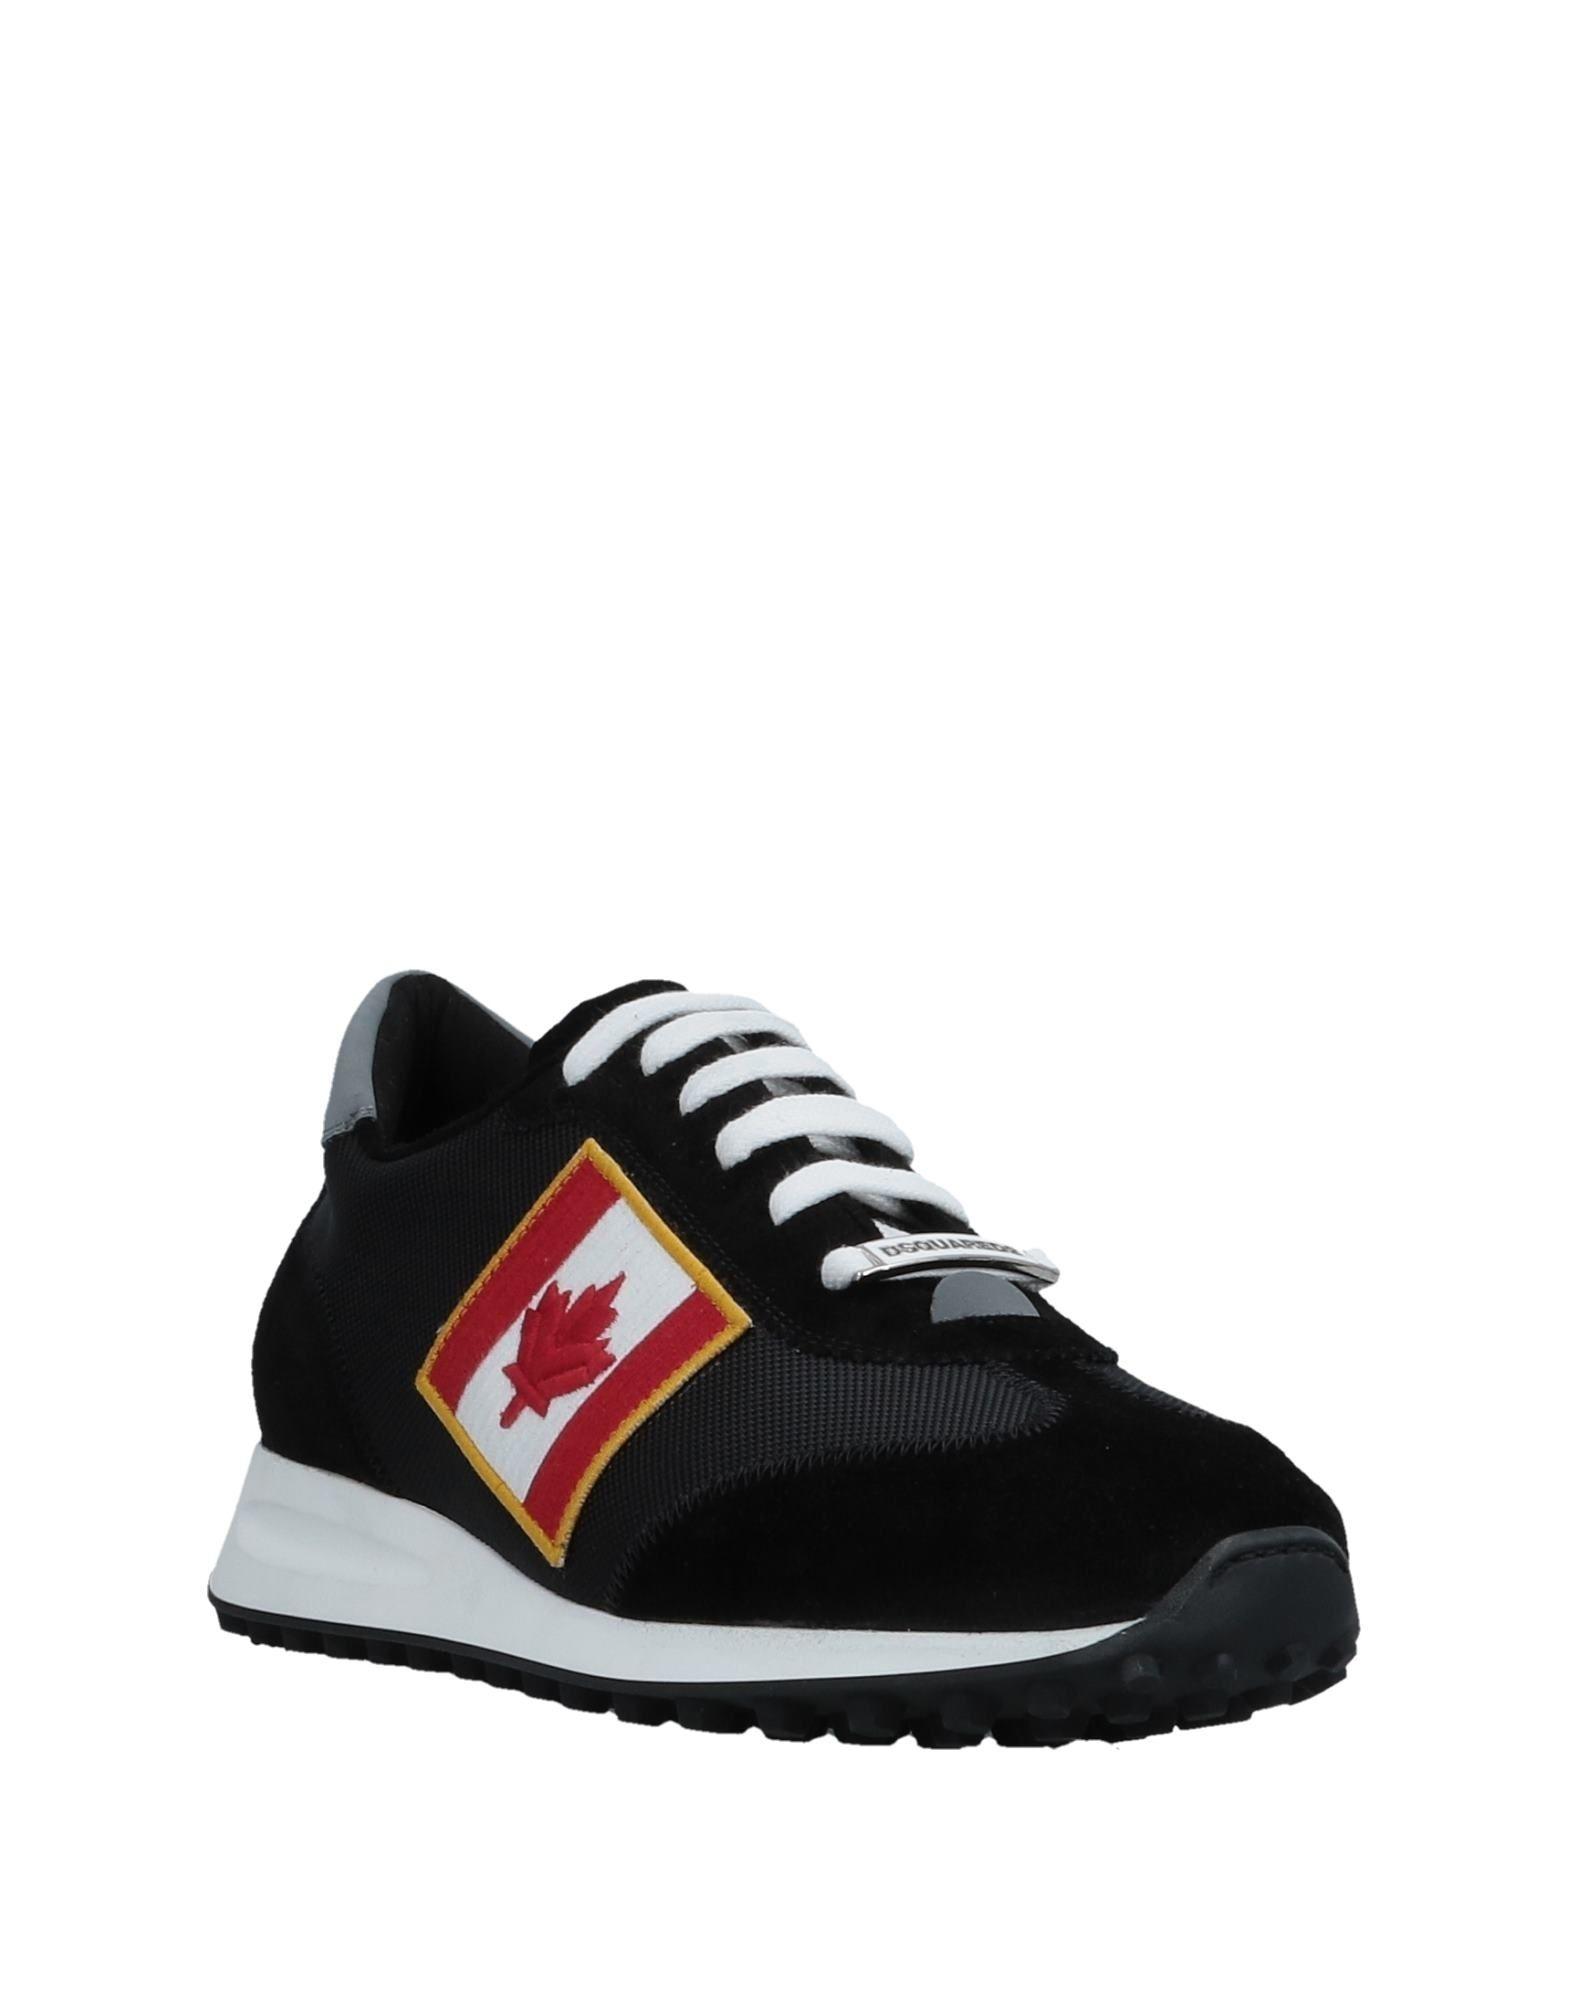 Dsquared2 Sneakers Qualität Herren  11505358XC Gute Qualität Sneakers beliebte Schuhe e9ca10